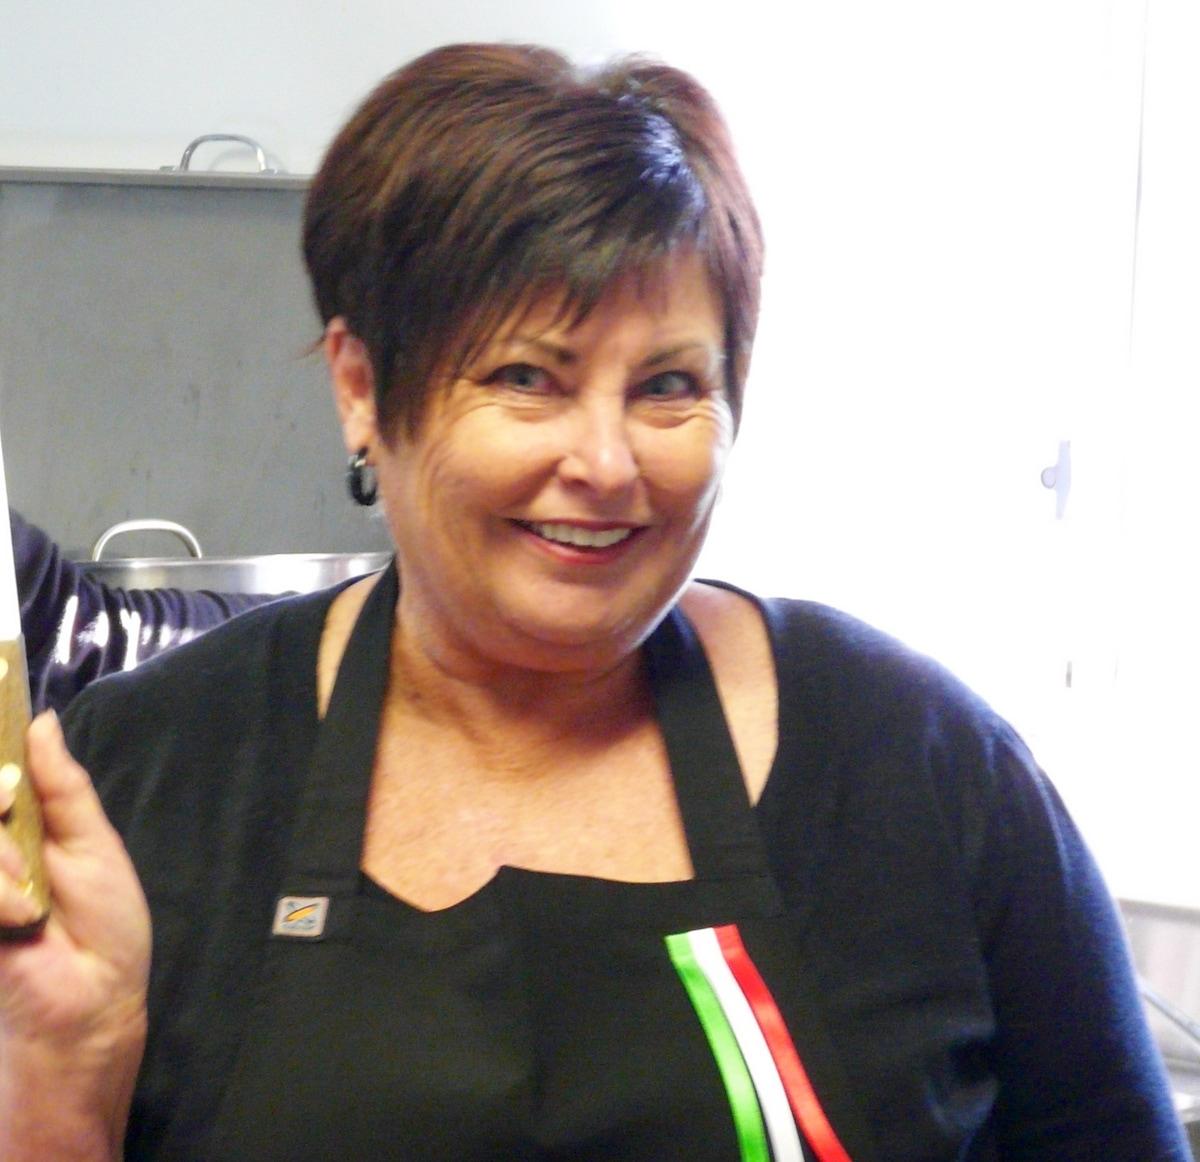 Margaret From Port Macquarie, Australia